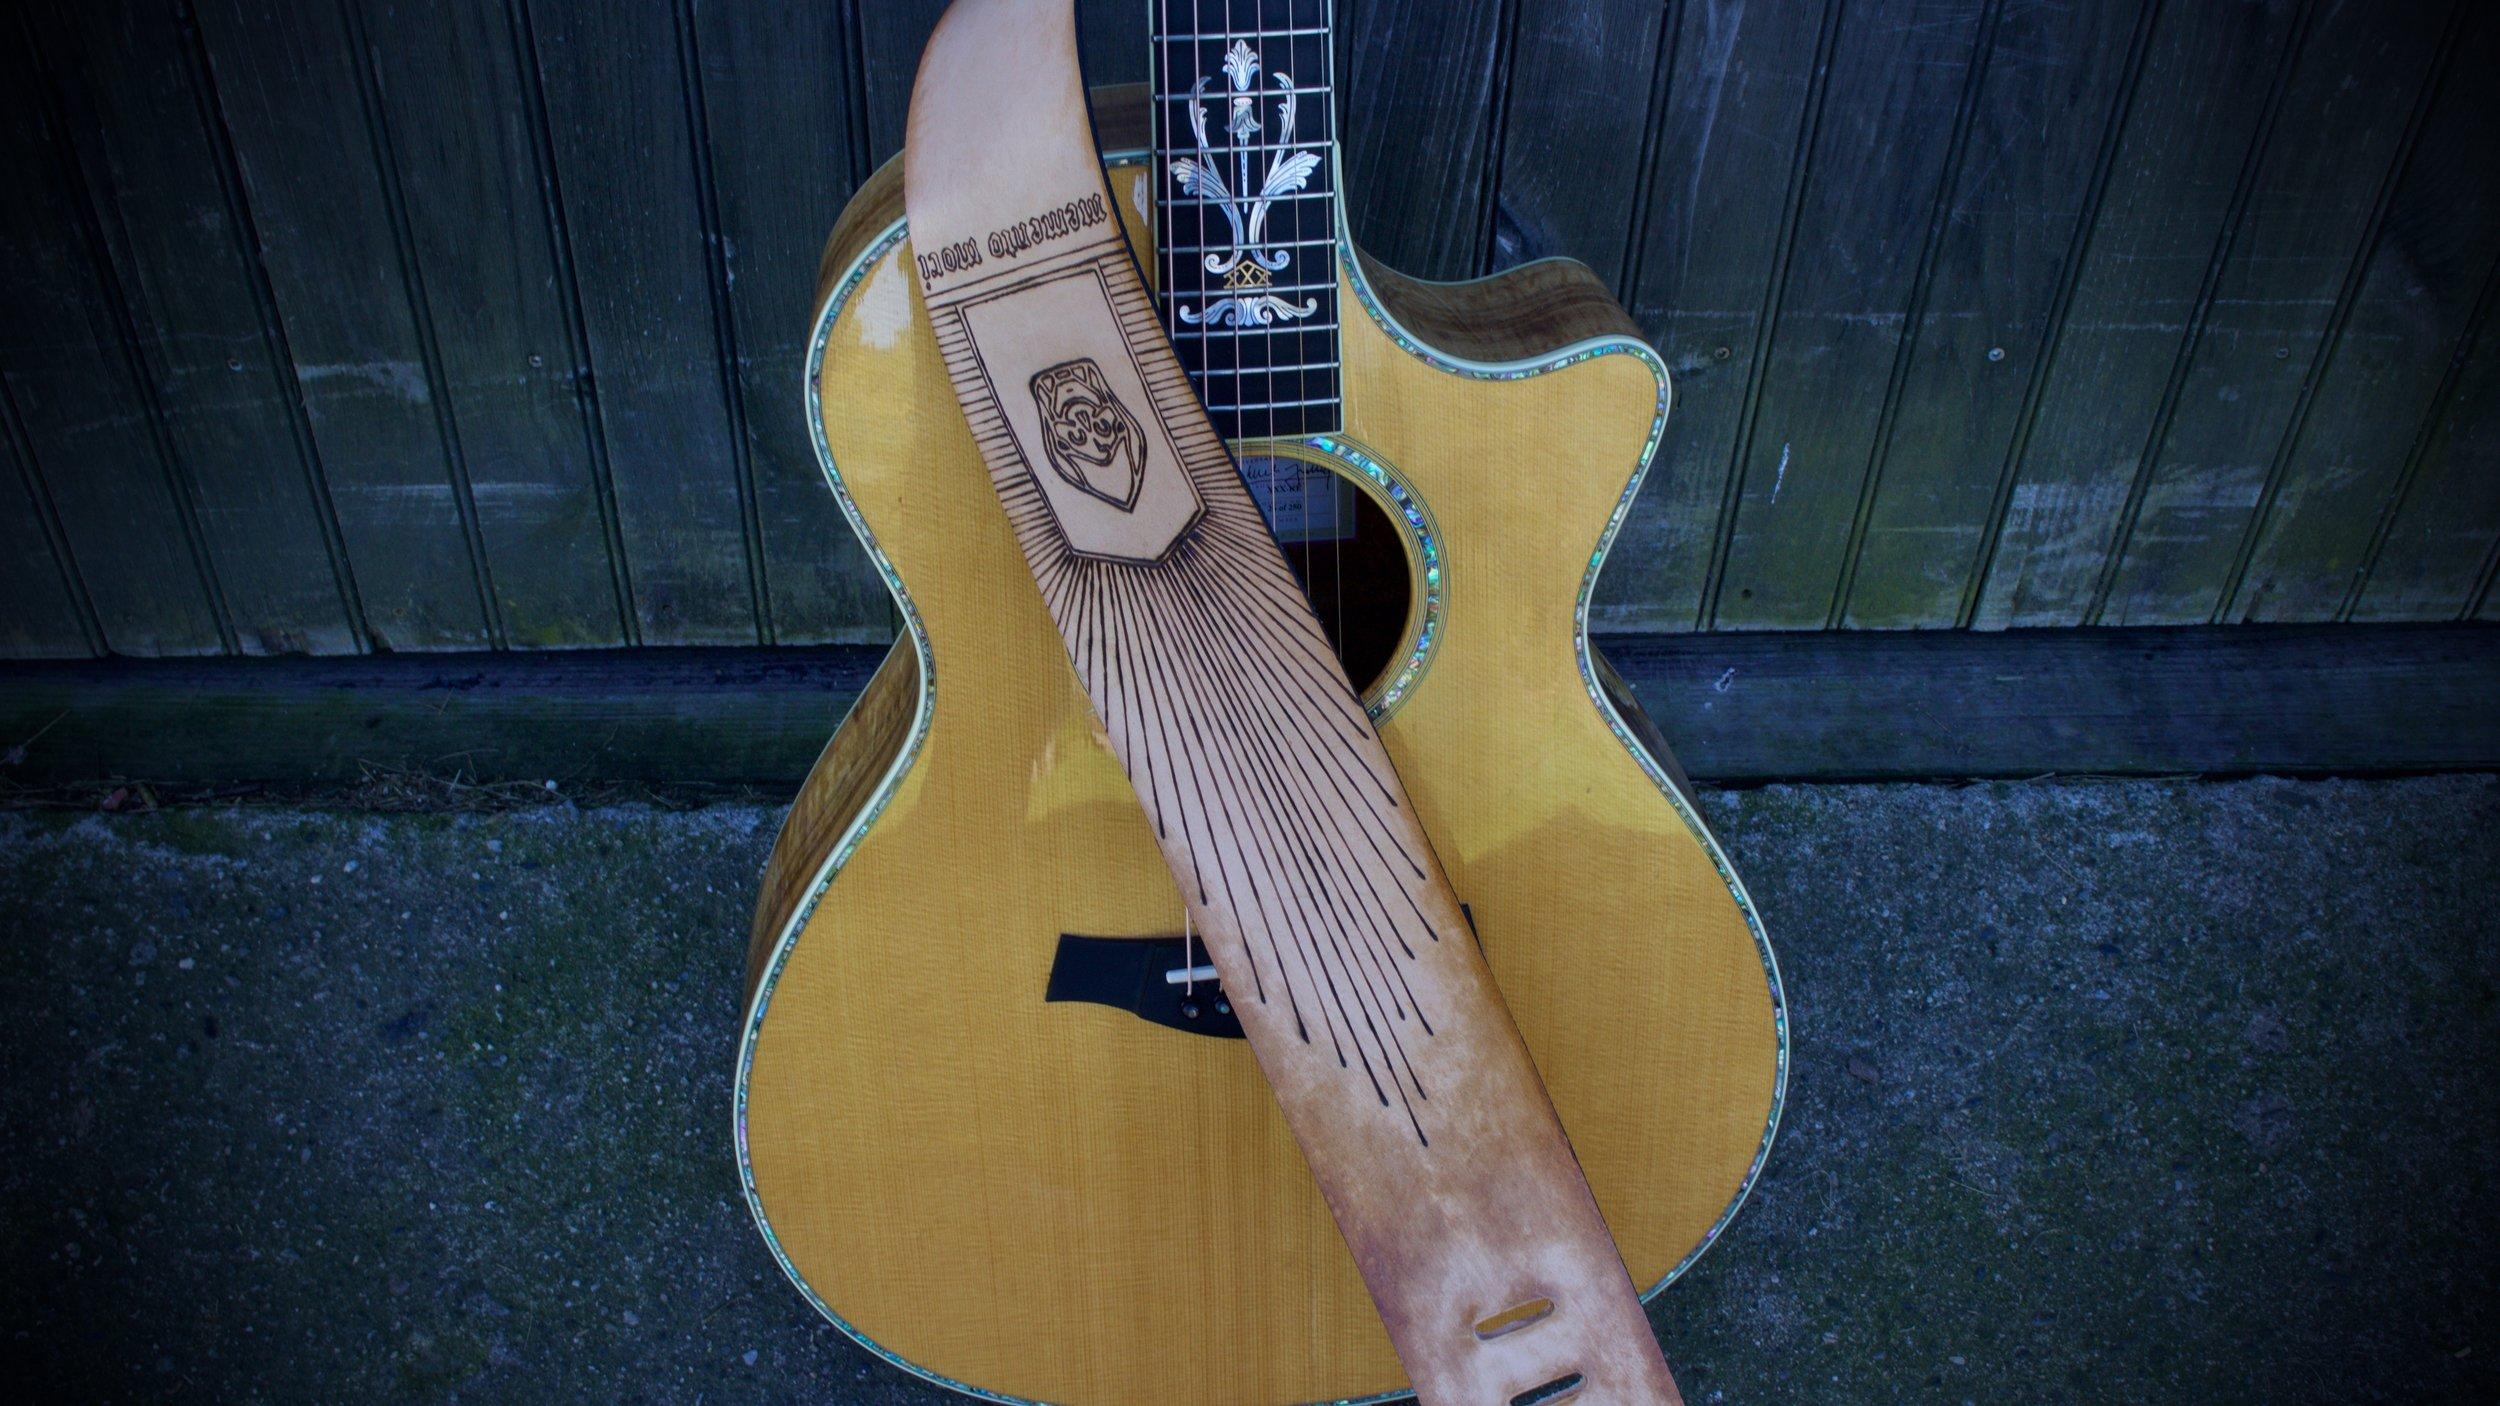 memento mori guitar strap 1.jpg